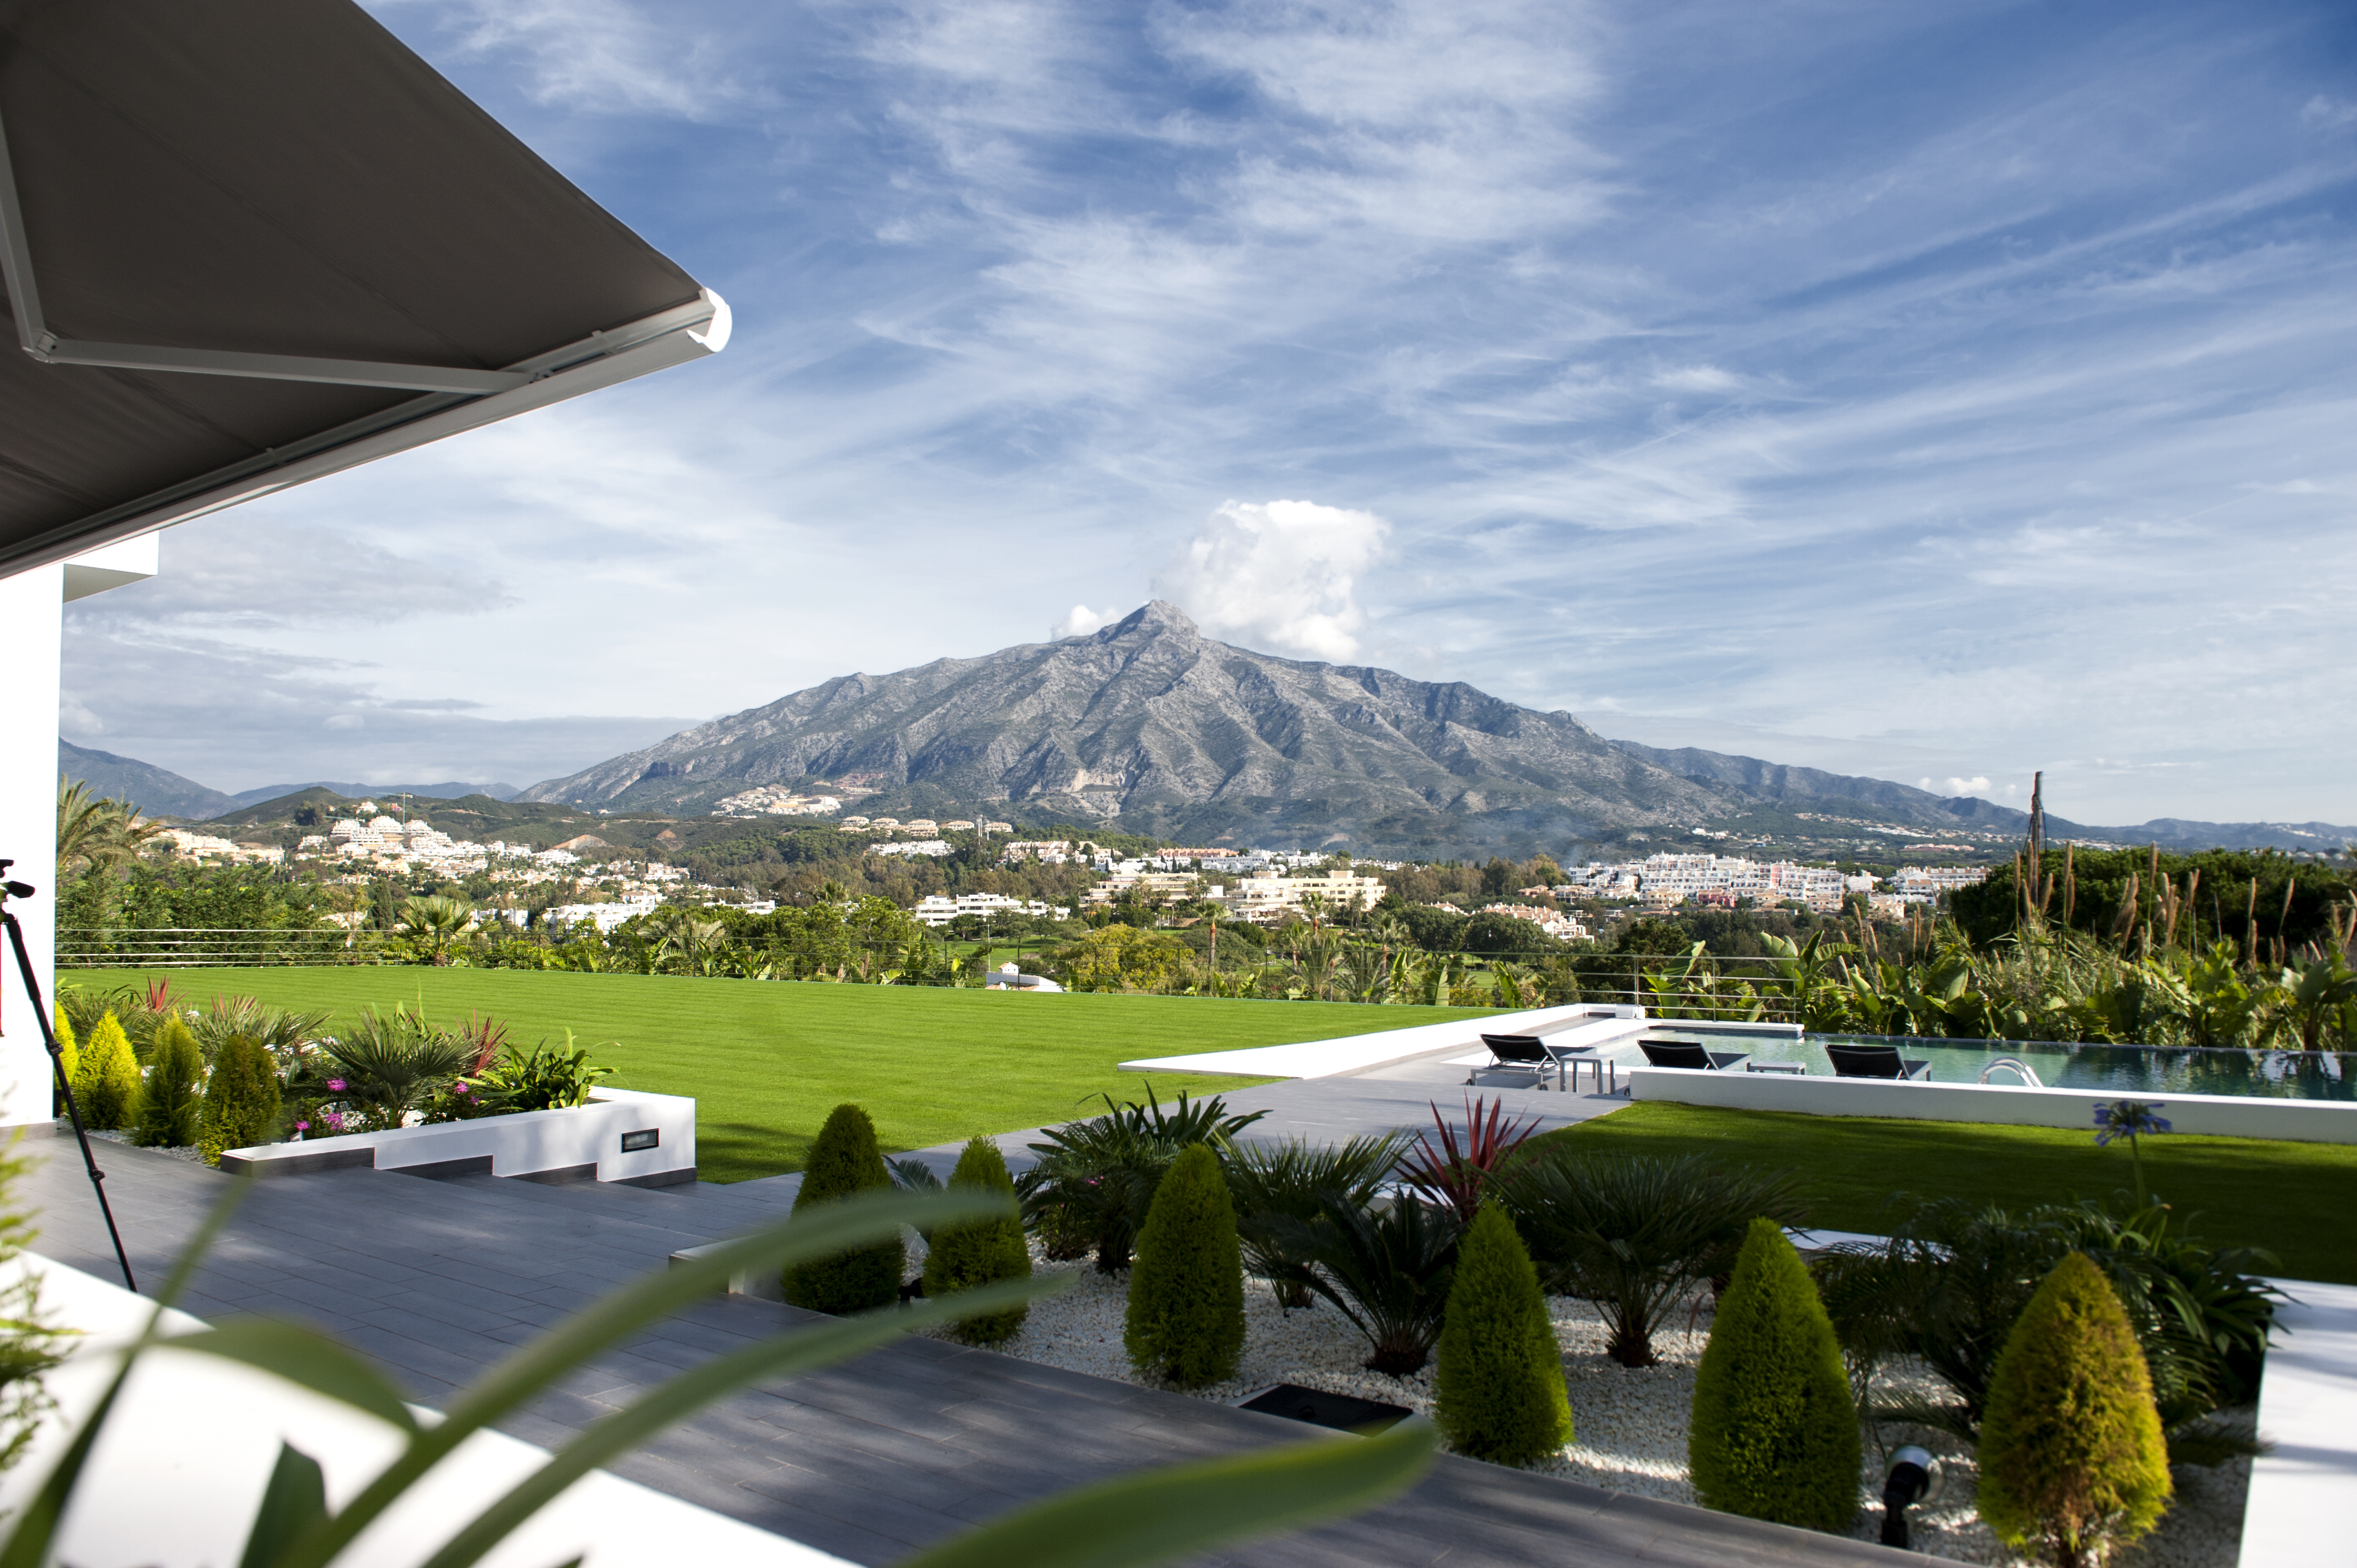 Nueva Andalucía: Terrains de Golf et Villas de luxe